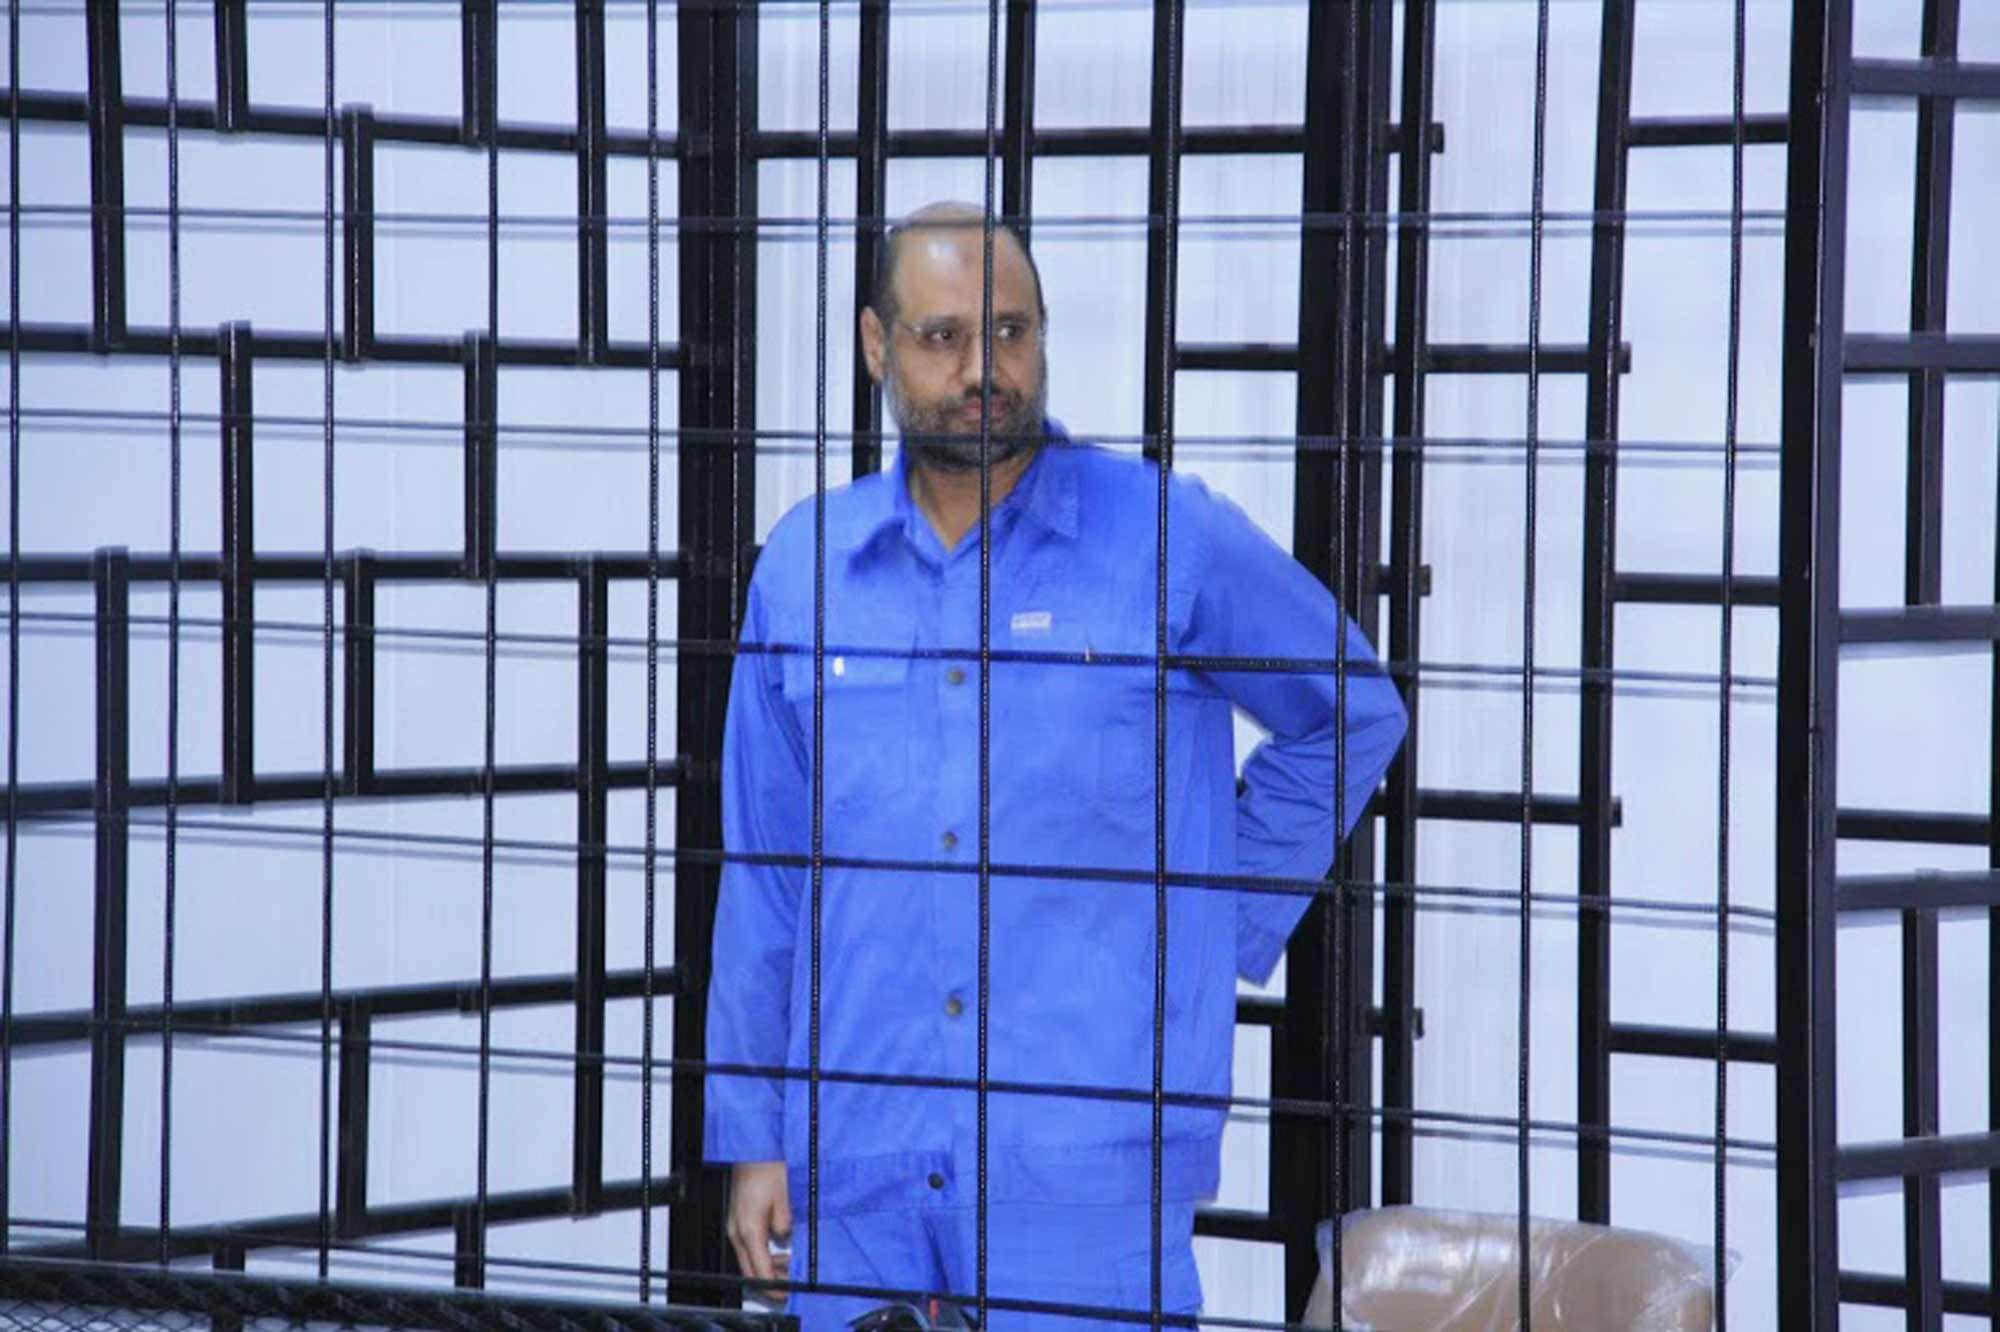 Libye : L'énigme judiciaire autour de Saïf Al-Islam Kadhafi